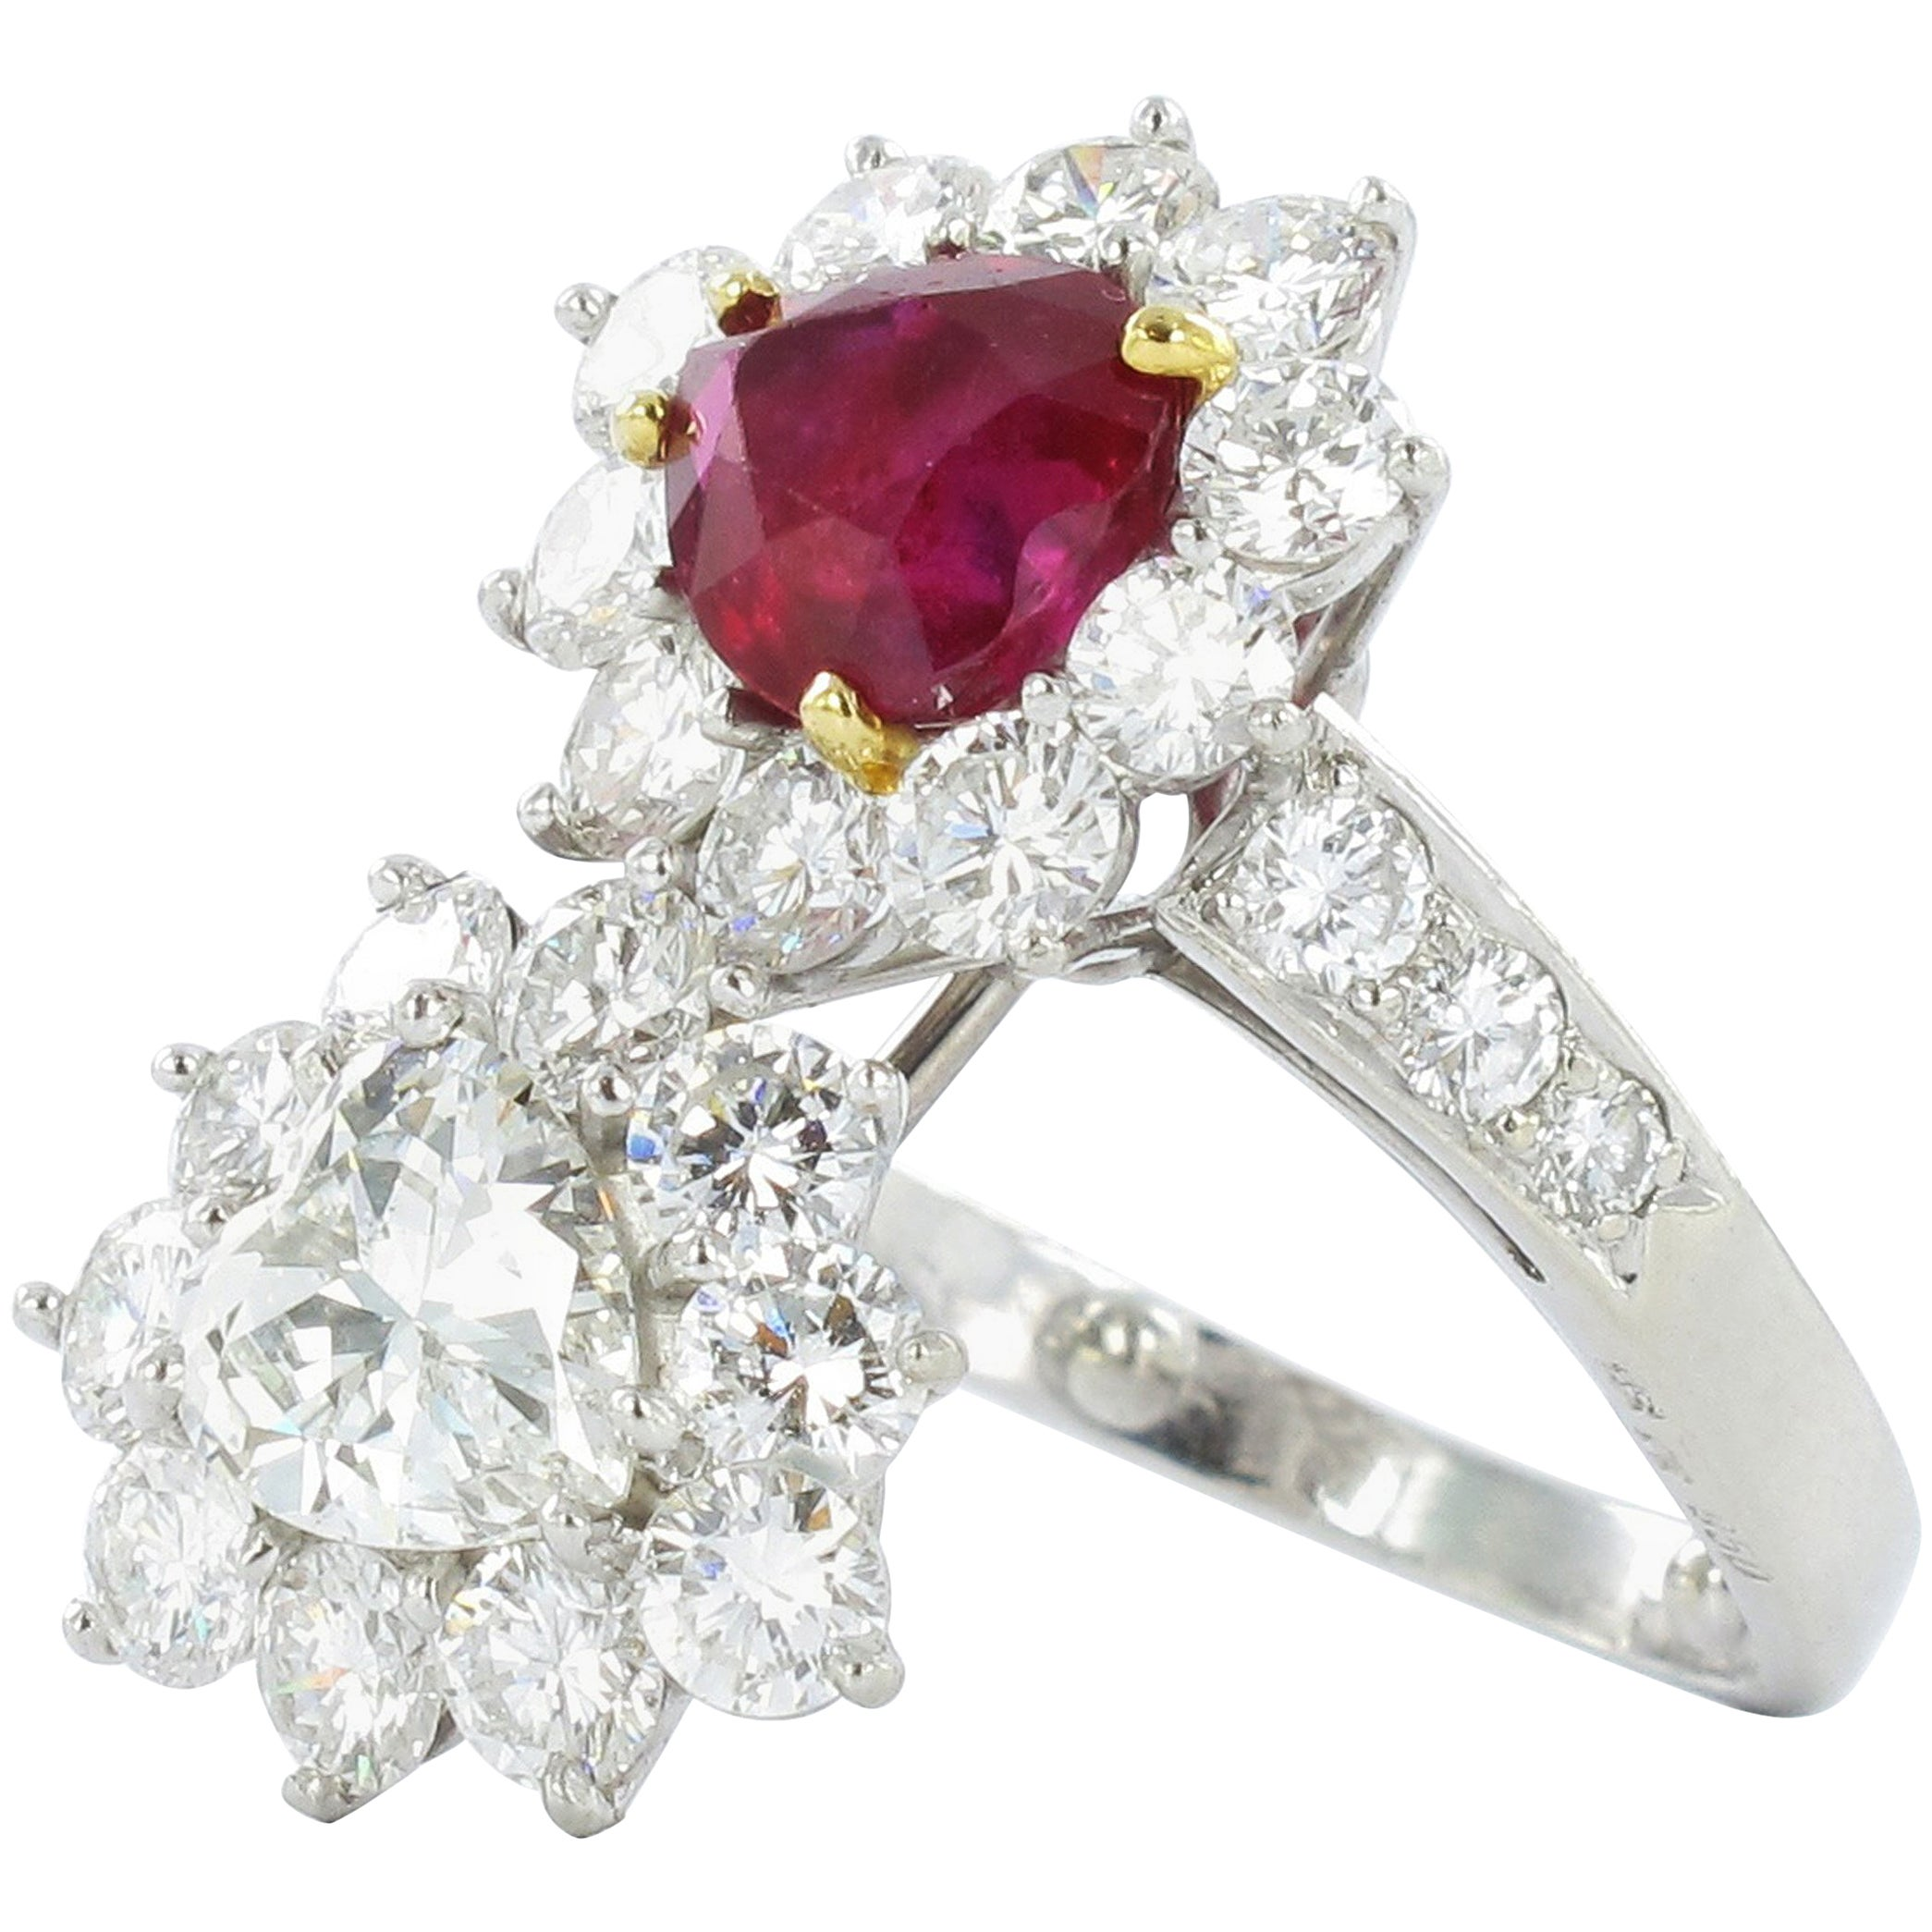 Gübelin Report Burma Ruby Diamond Toi et Moi Platinum Ring